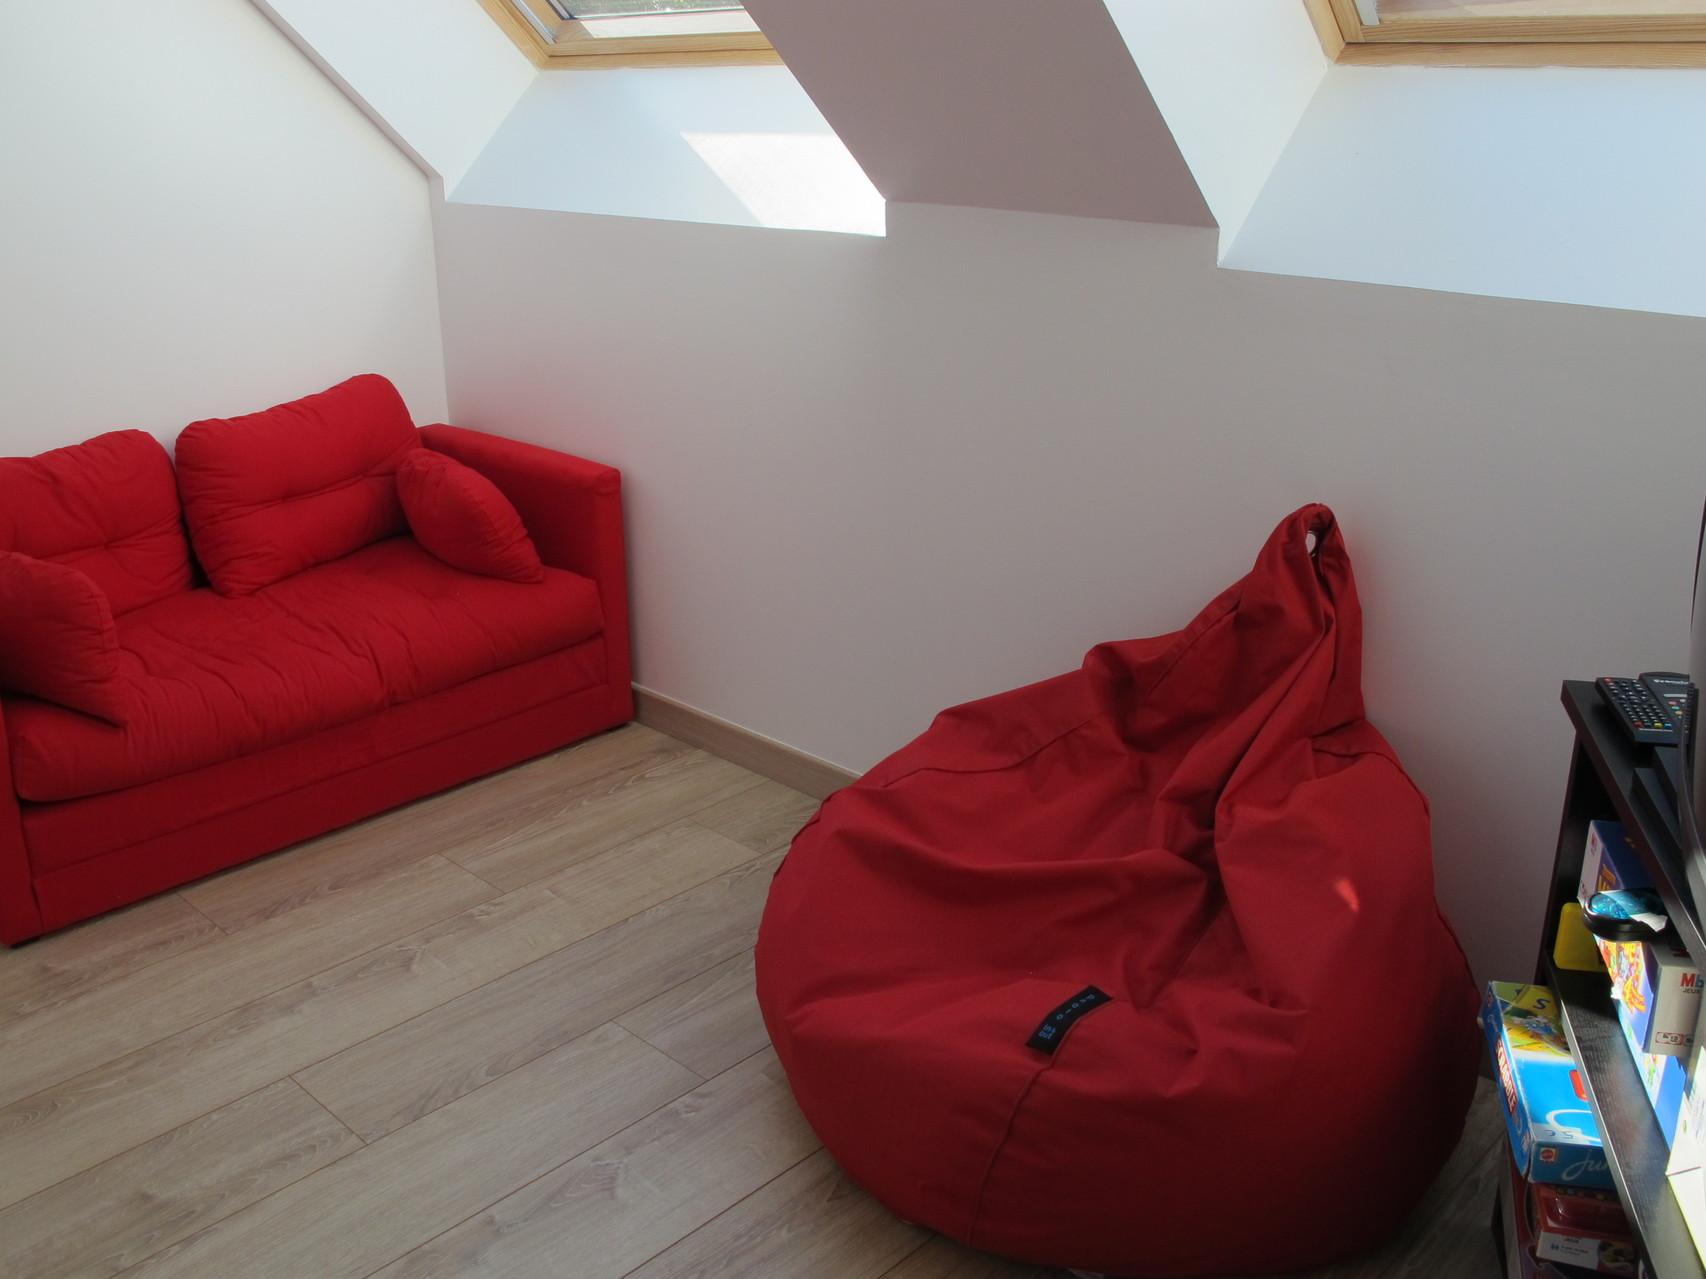 Palier-Bureau & espace loisirs